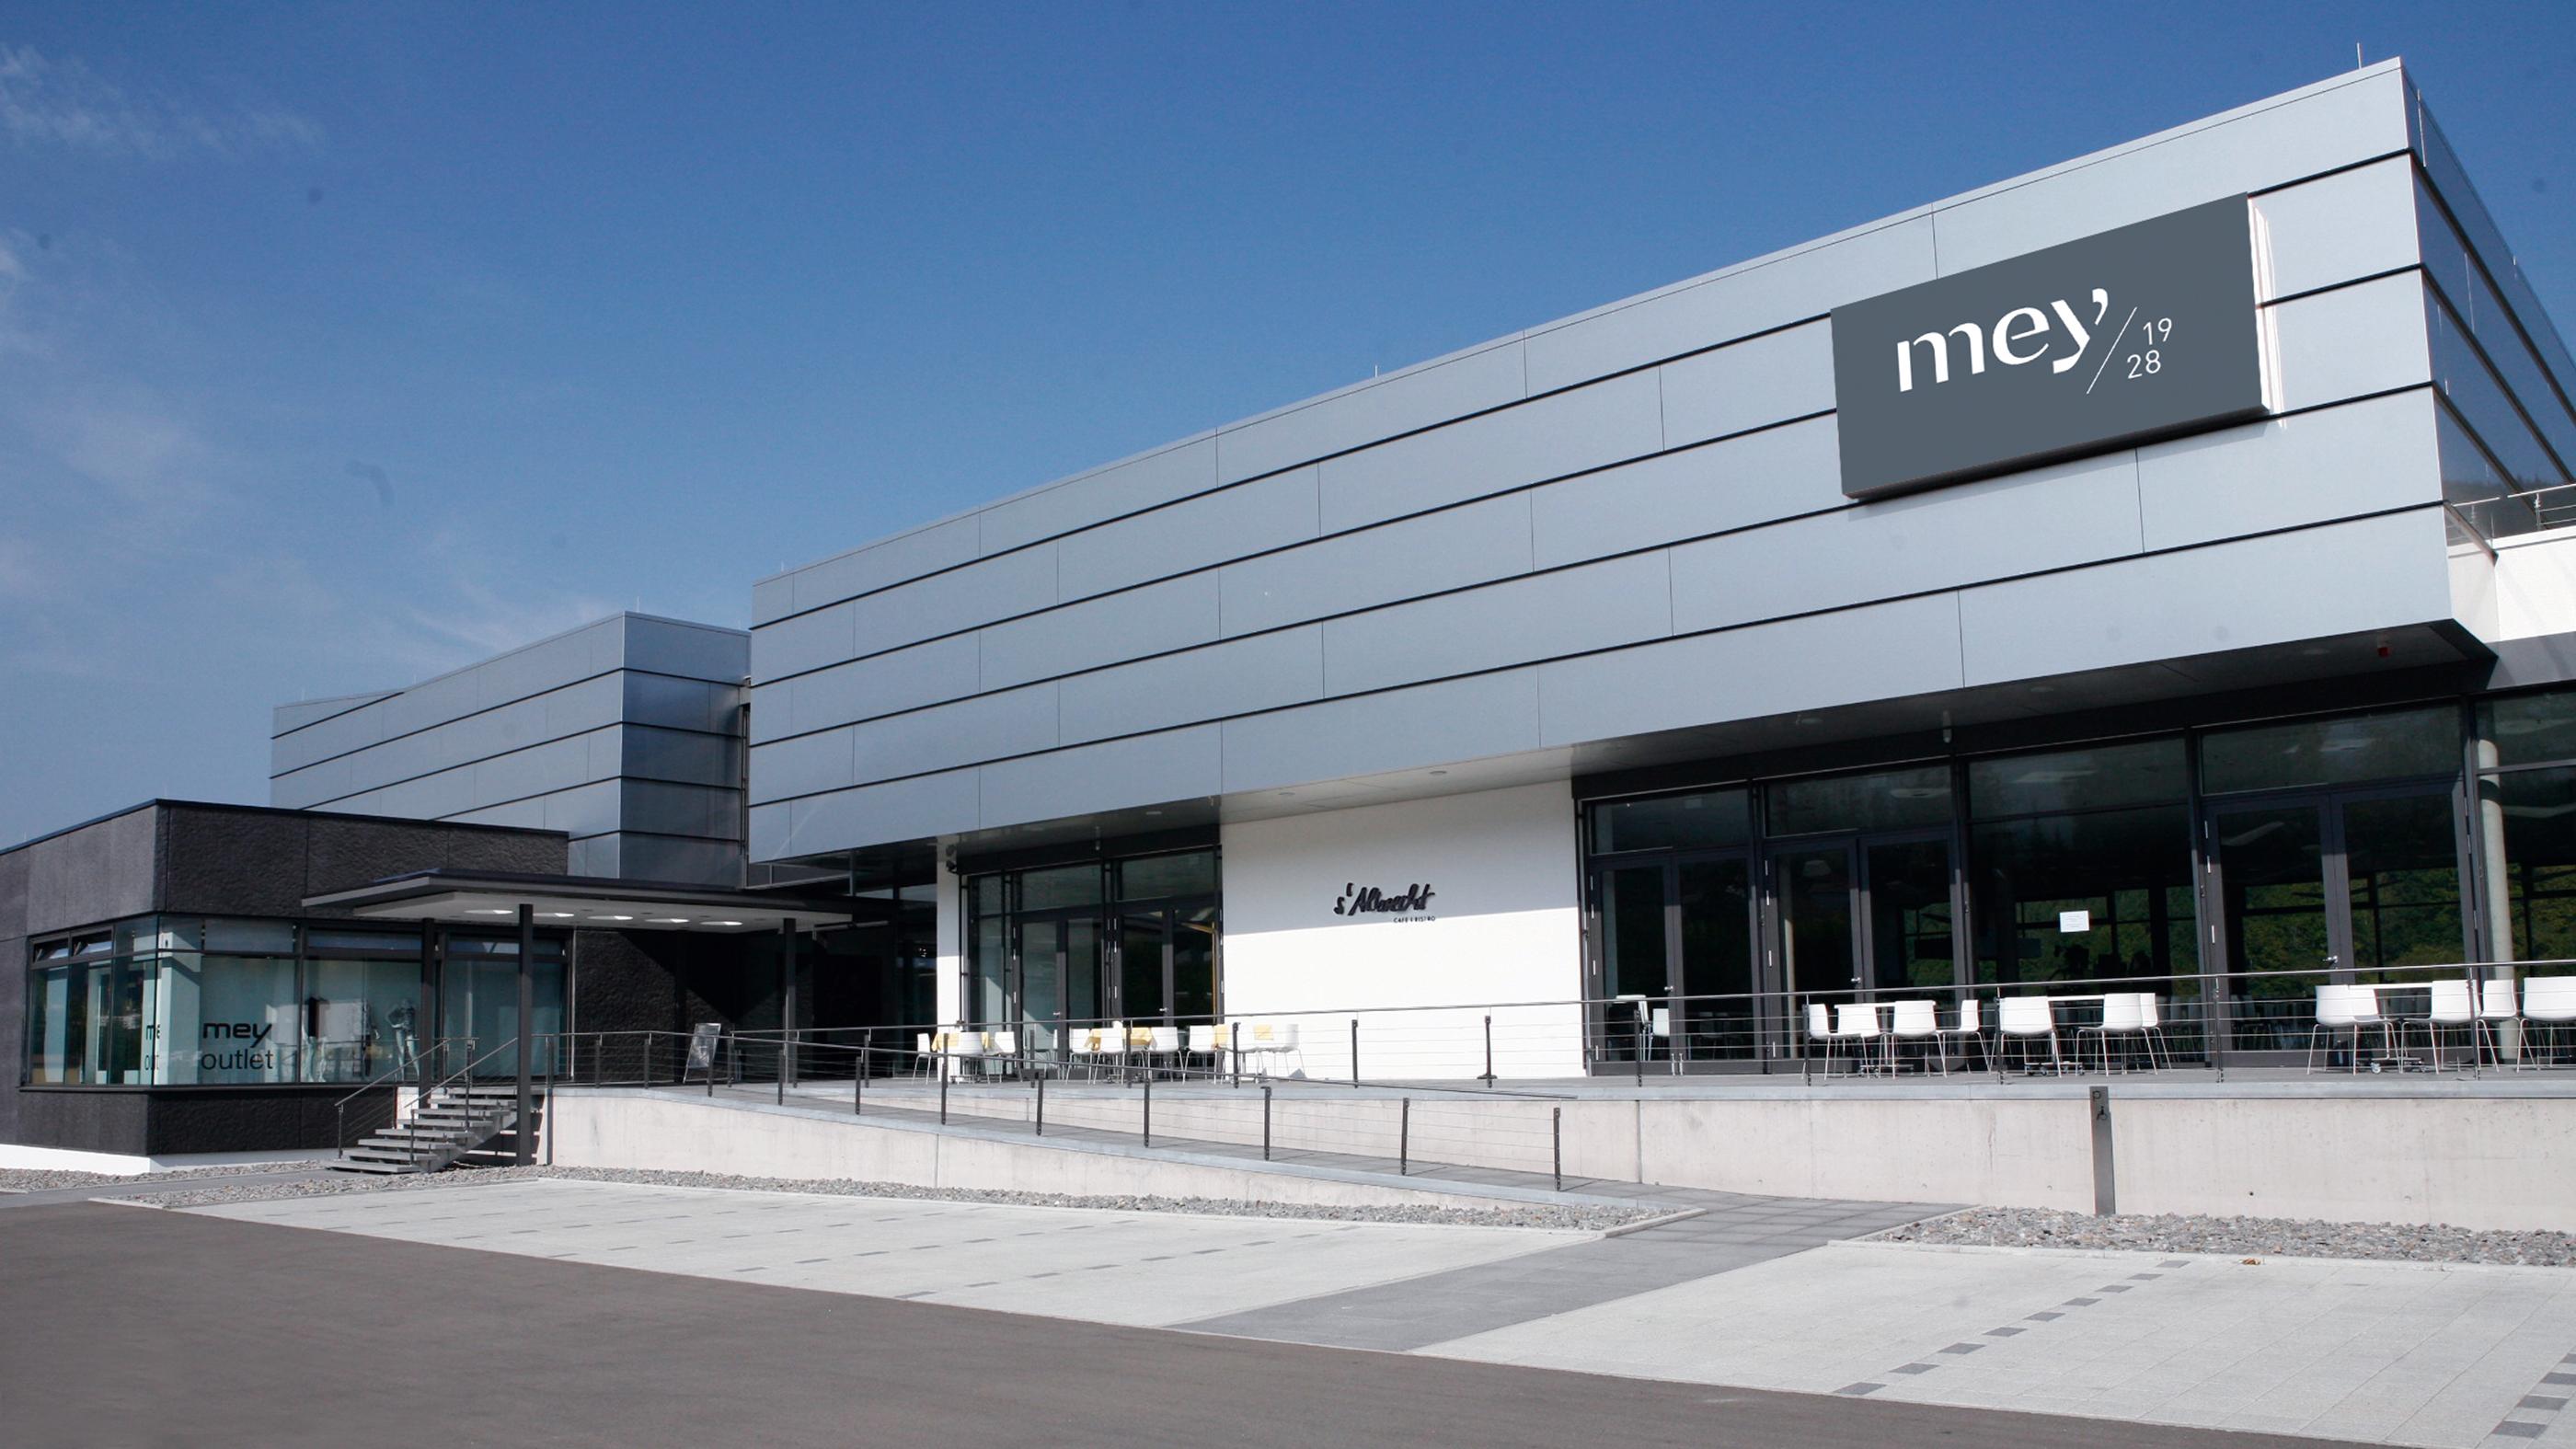 mey-Neubau in Albstadt| mey®